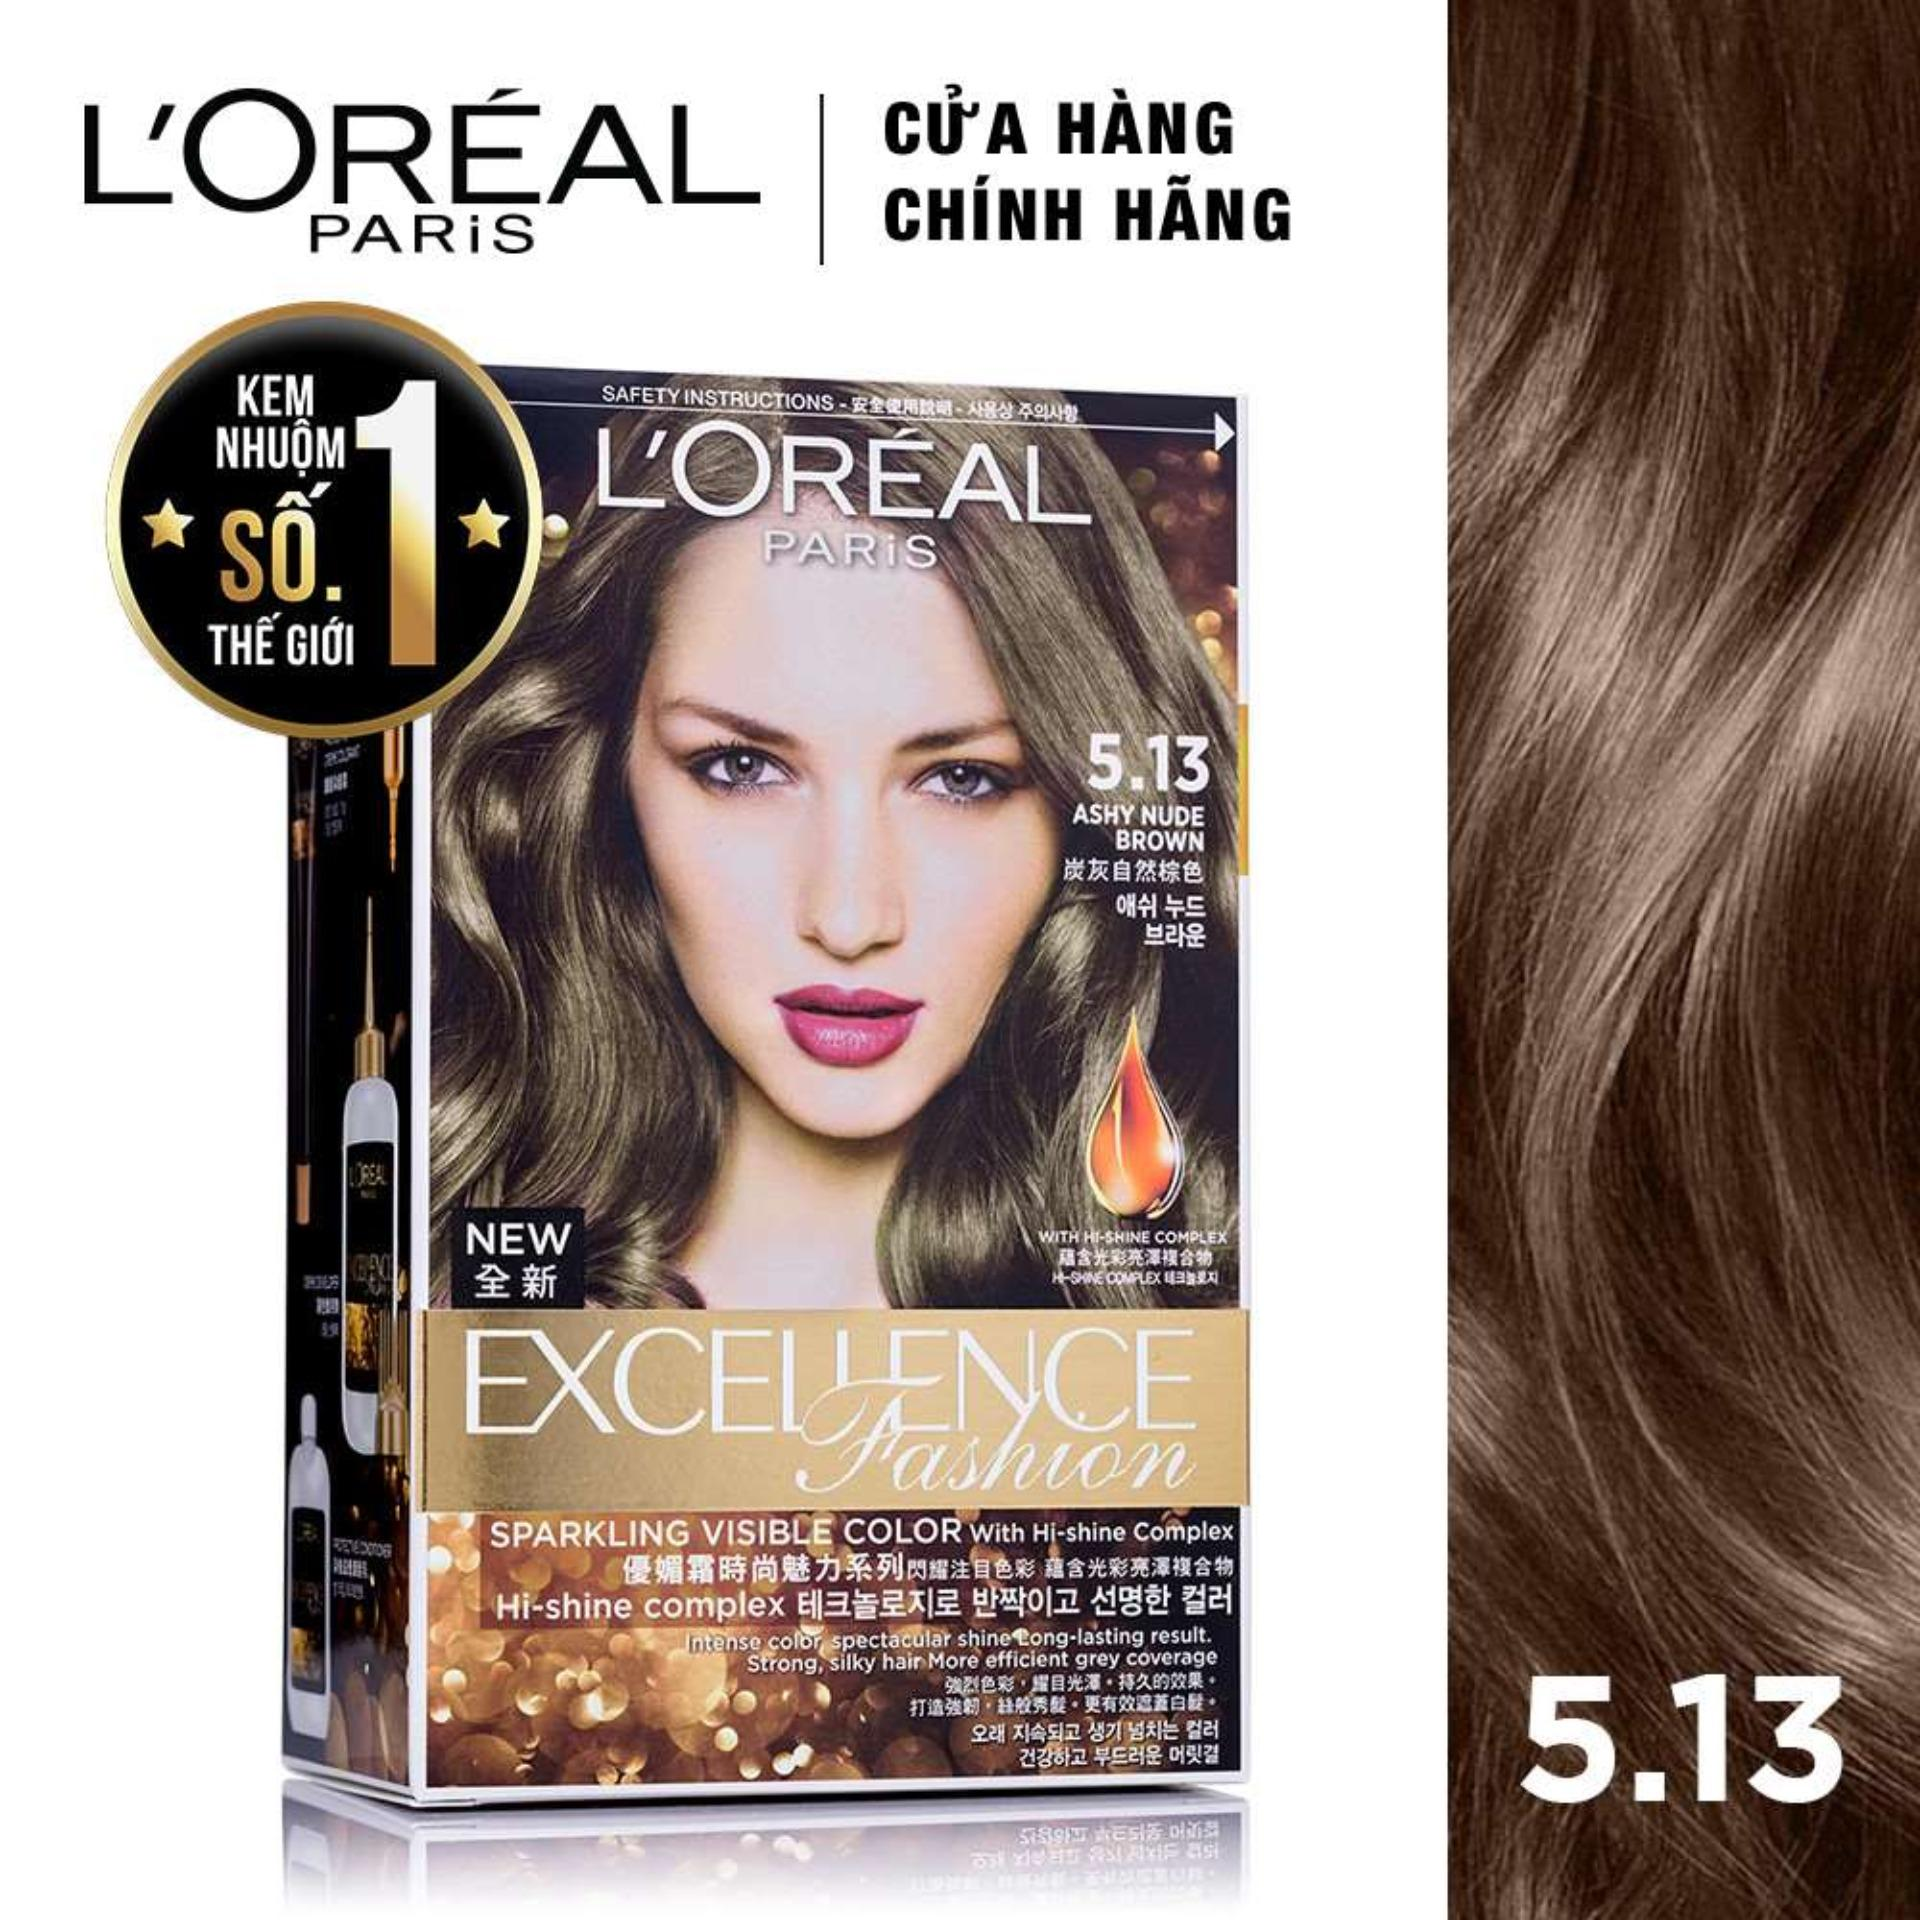 Kem nhuộm dưỡng tóc LOreal Paris Excellence Fashion 172ml